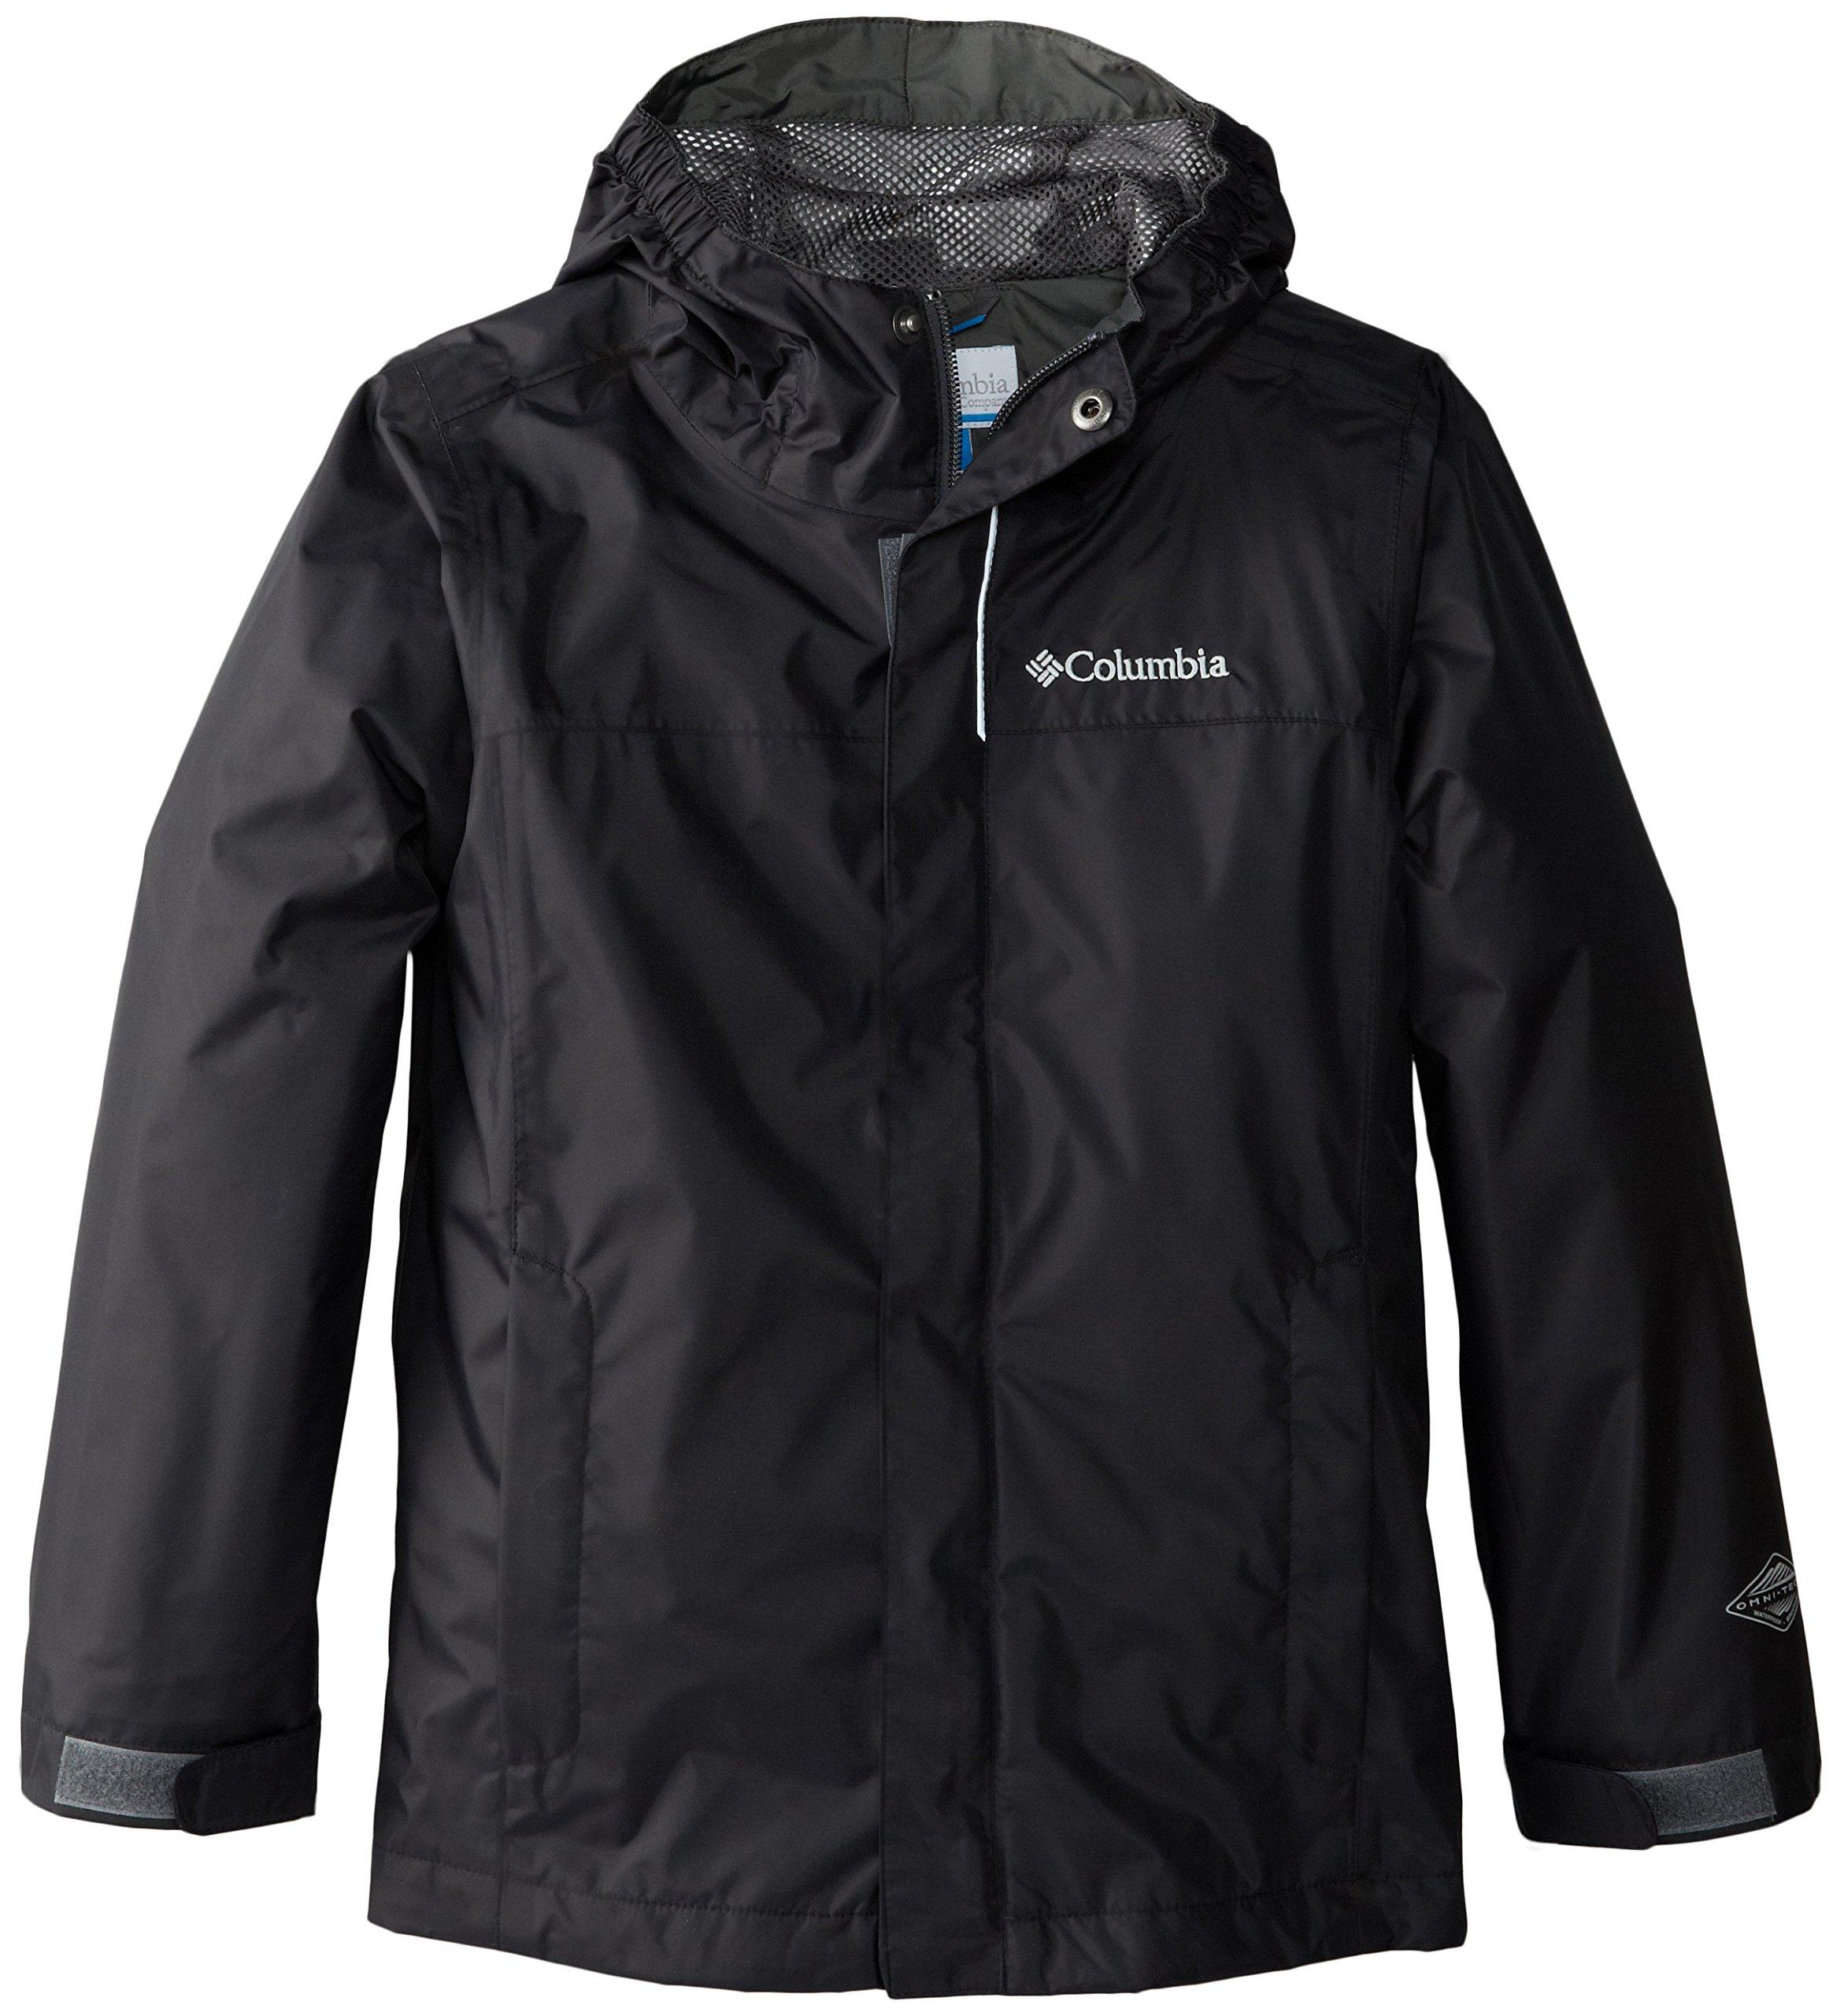 Columbia Little Boys' Watertight Jacket, Black, X-Small